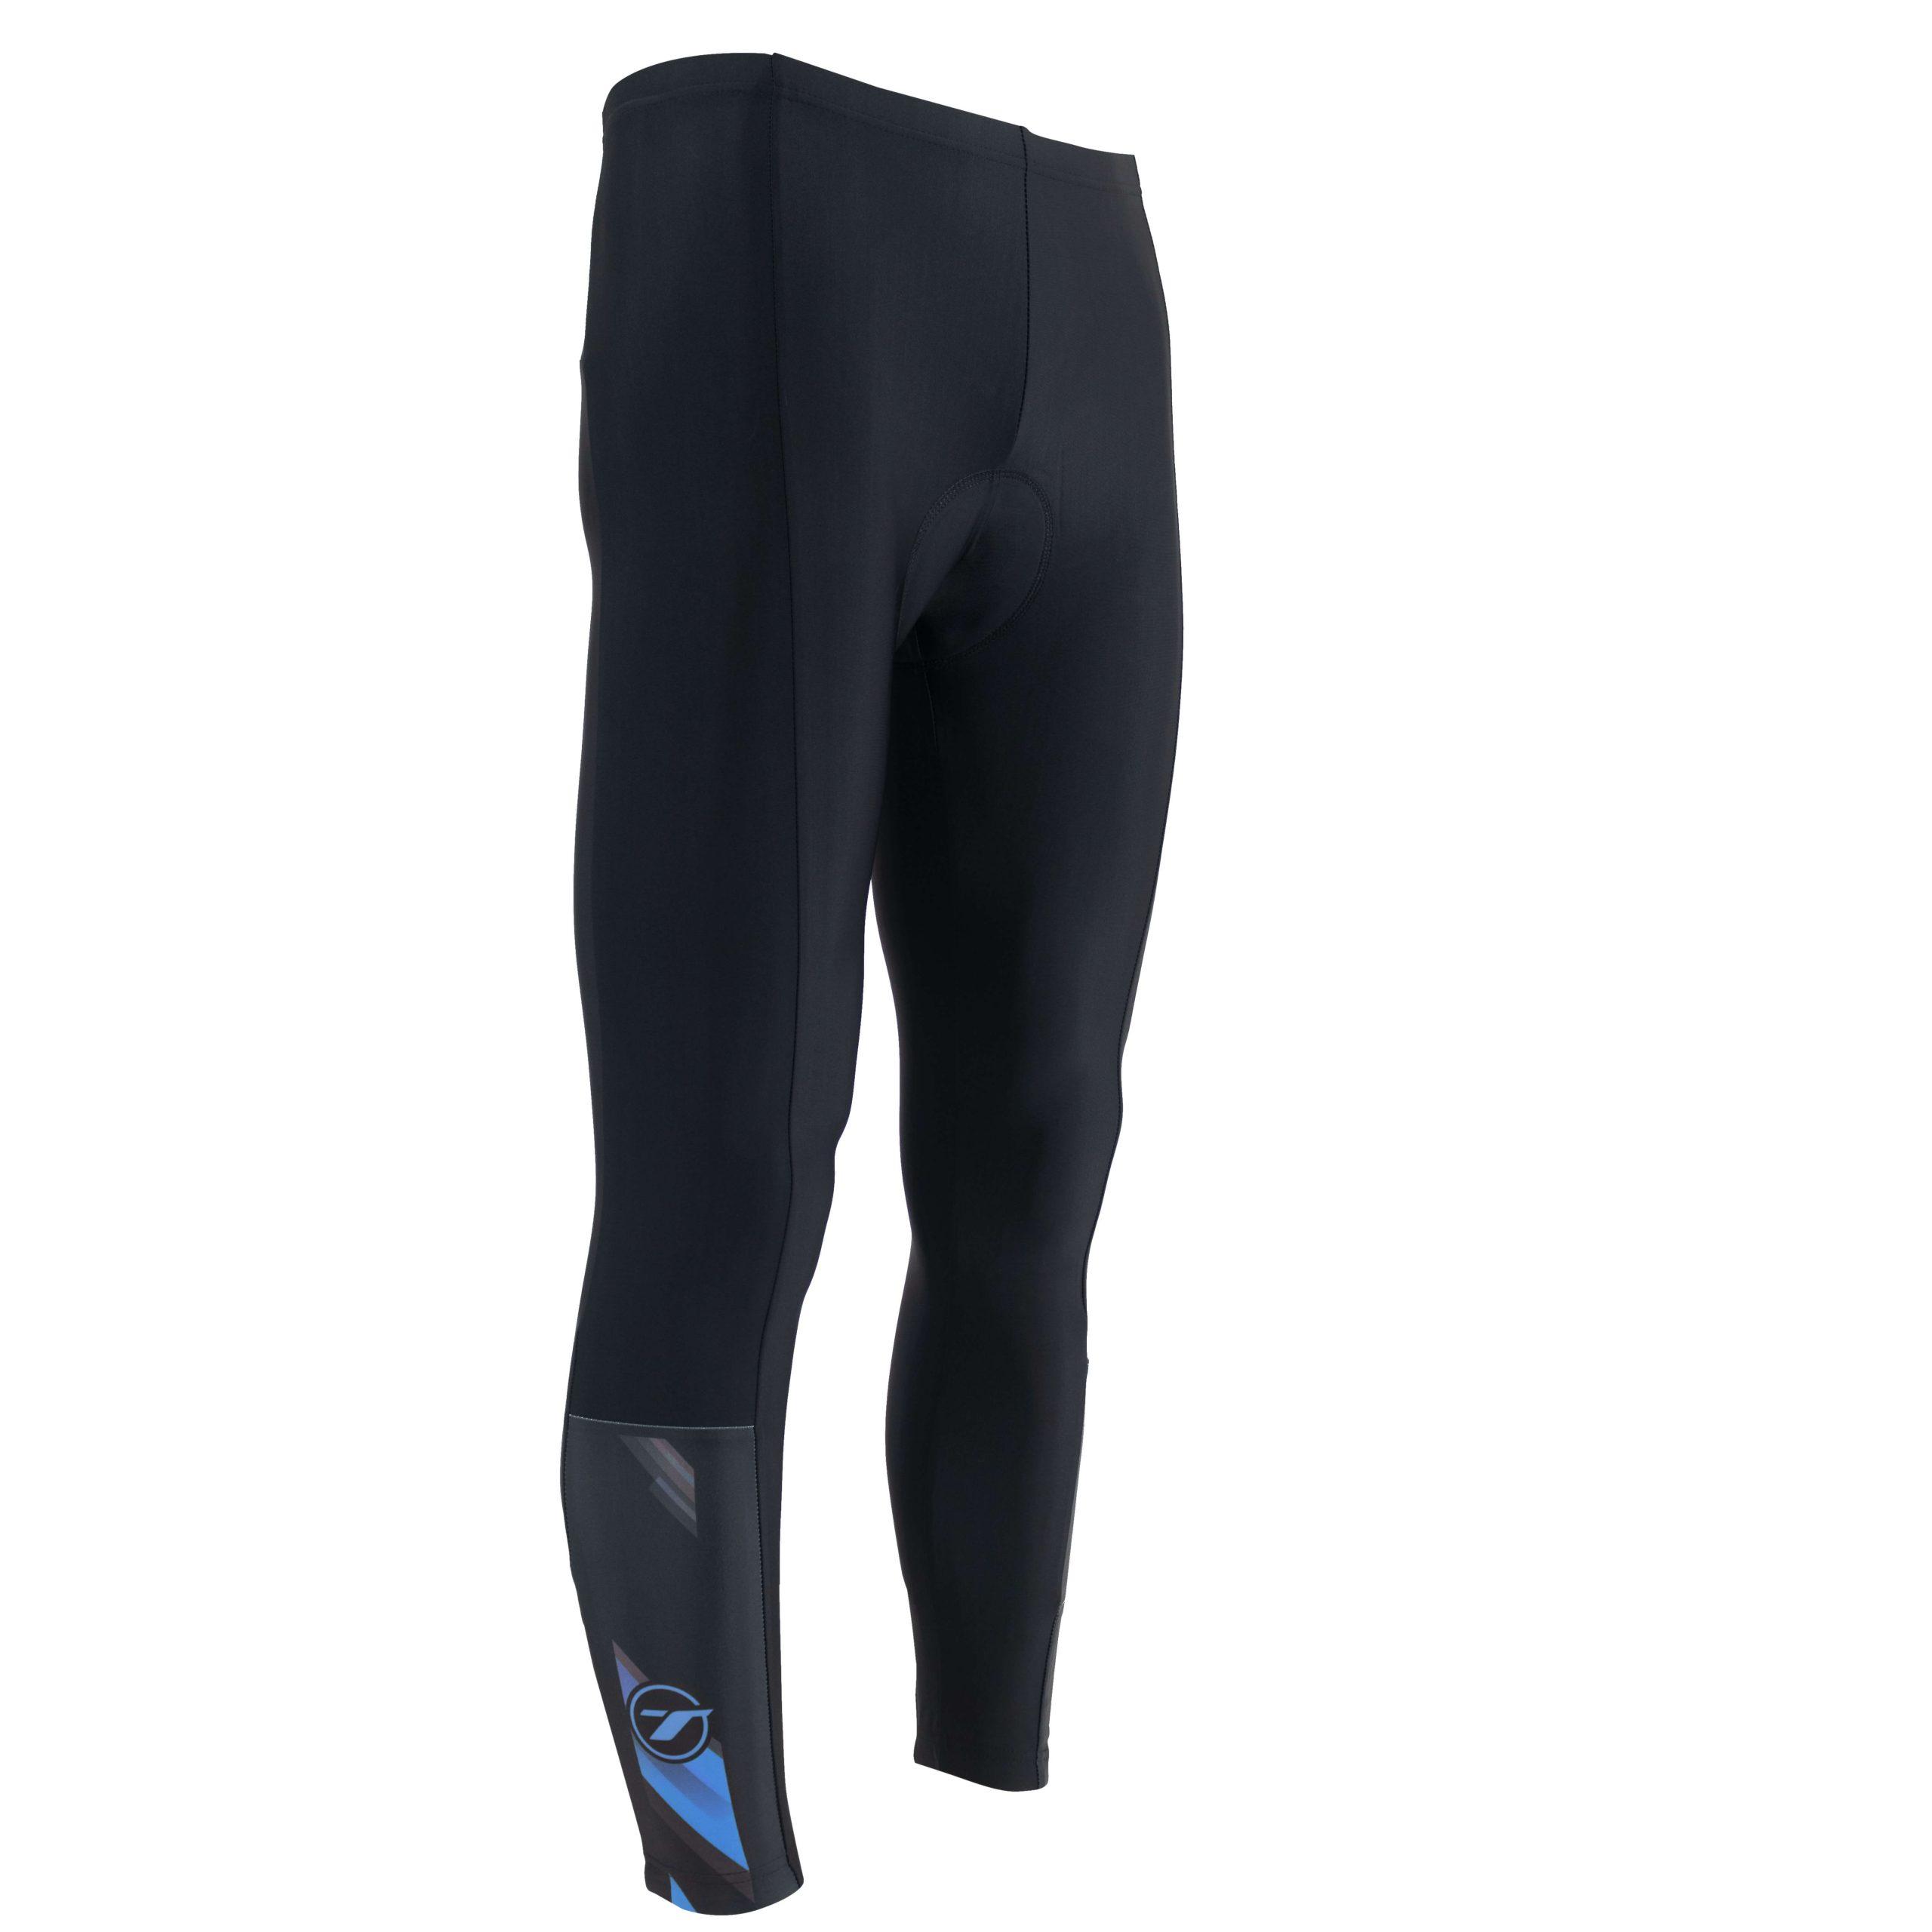 Camisa manga longa para ciclismo STORM | PRO LINE 6